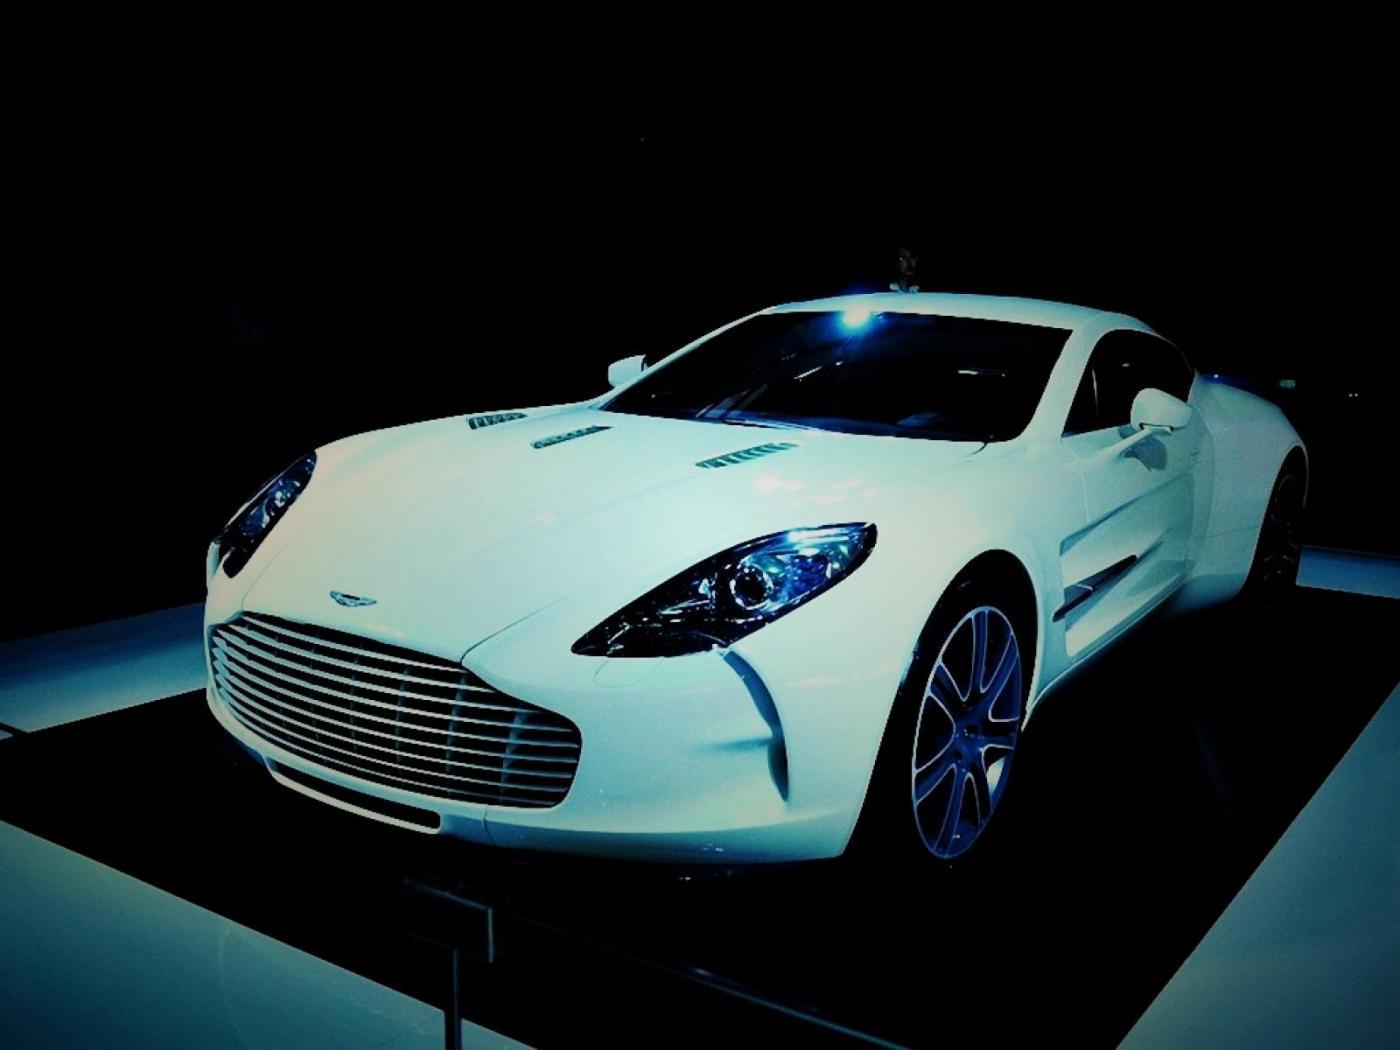 aston martin one 77 52999 1400x1050 Aston martin one 77 HD masast 1400x1050